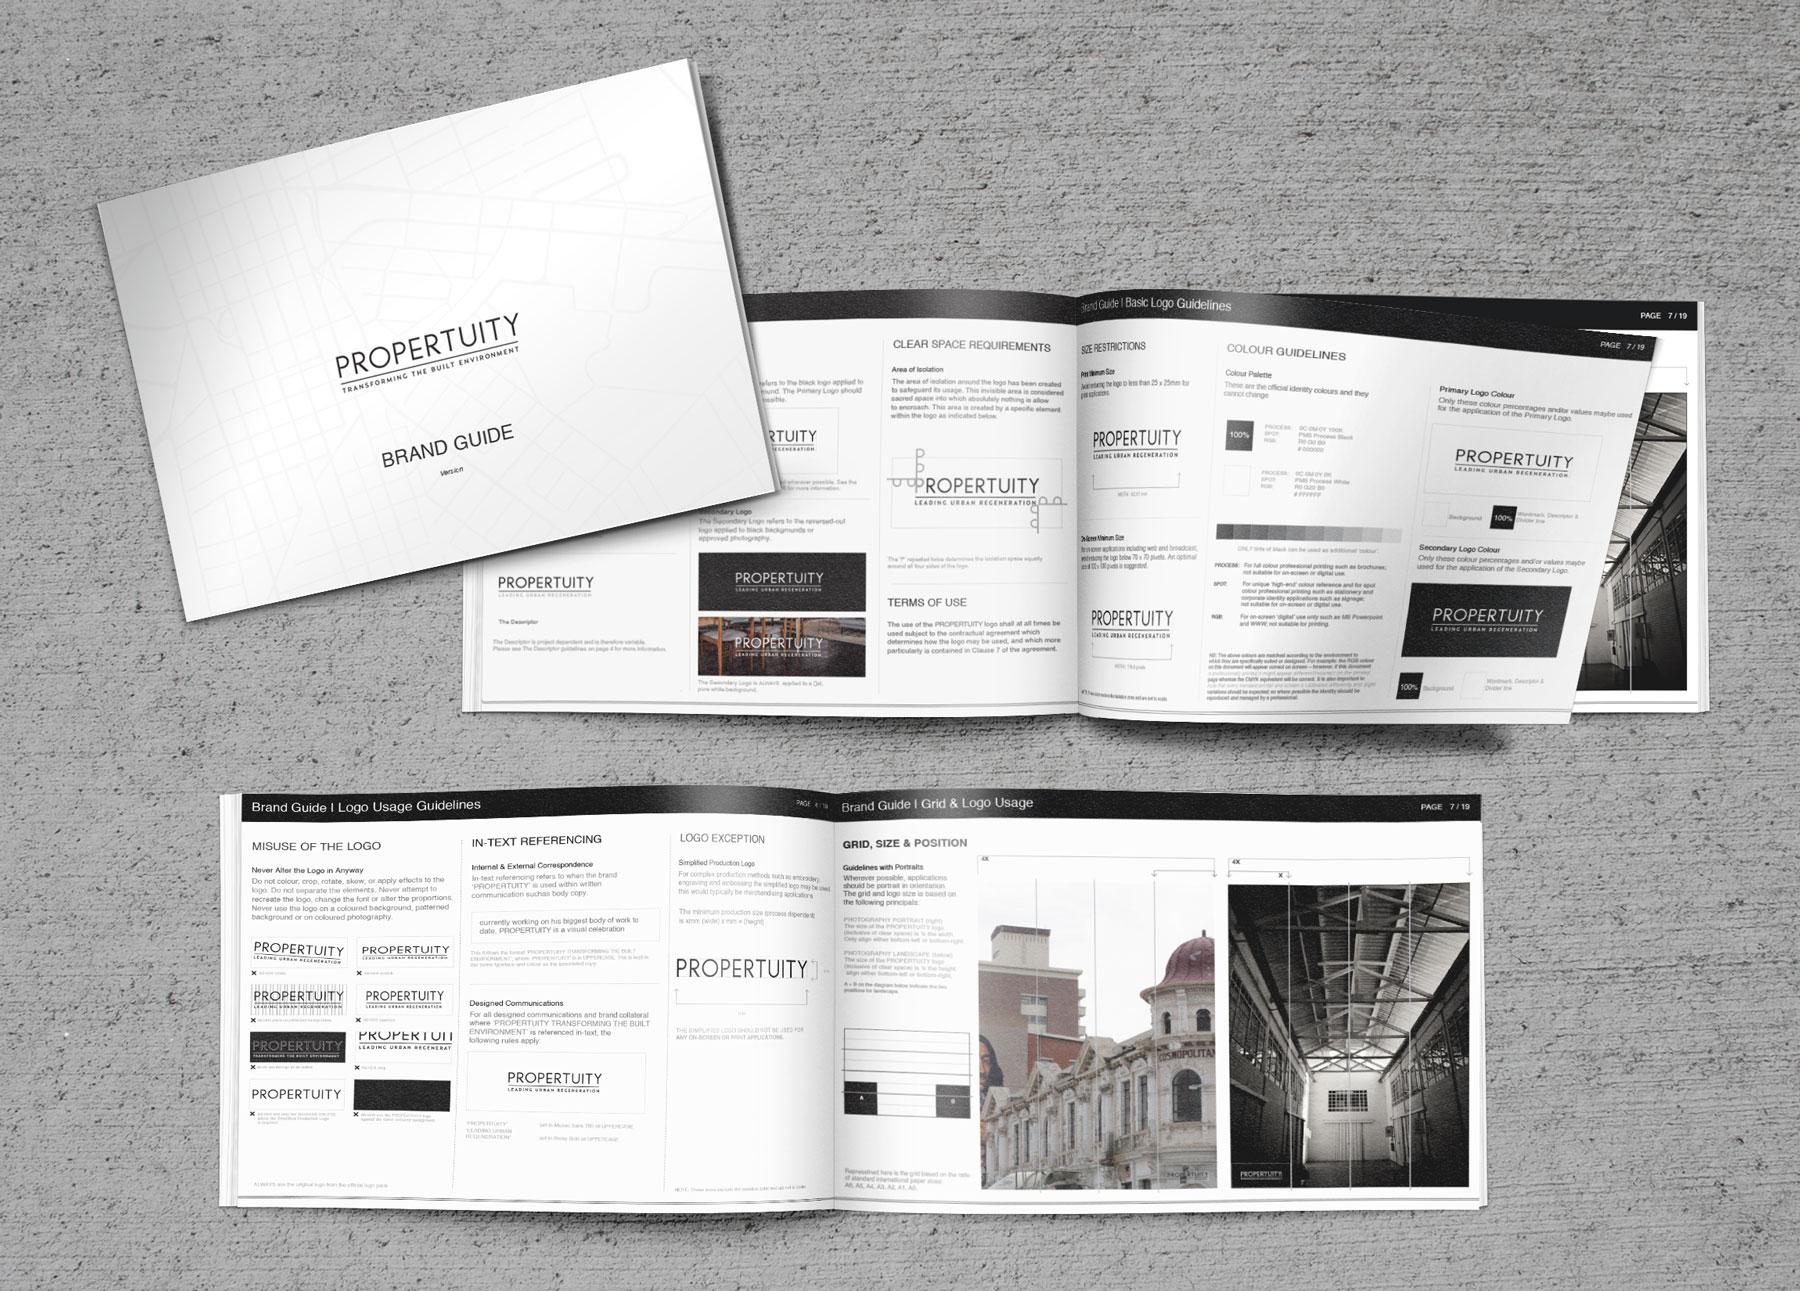 propertuity_brand-guide_211014